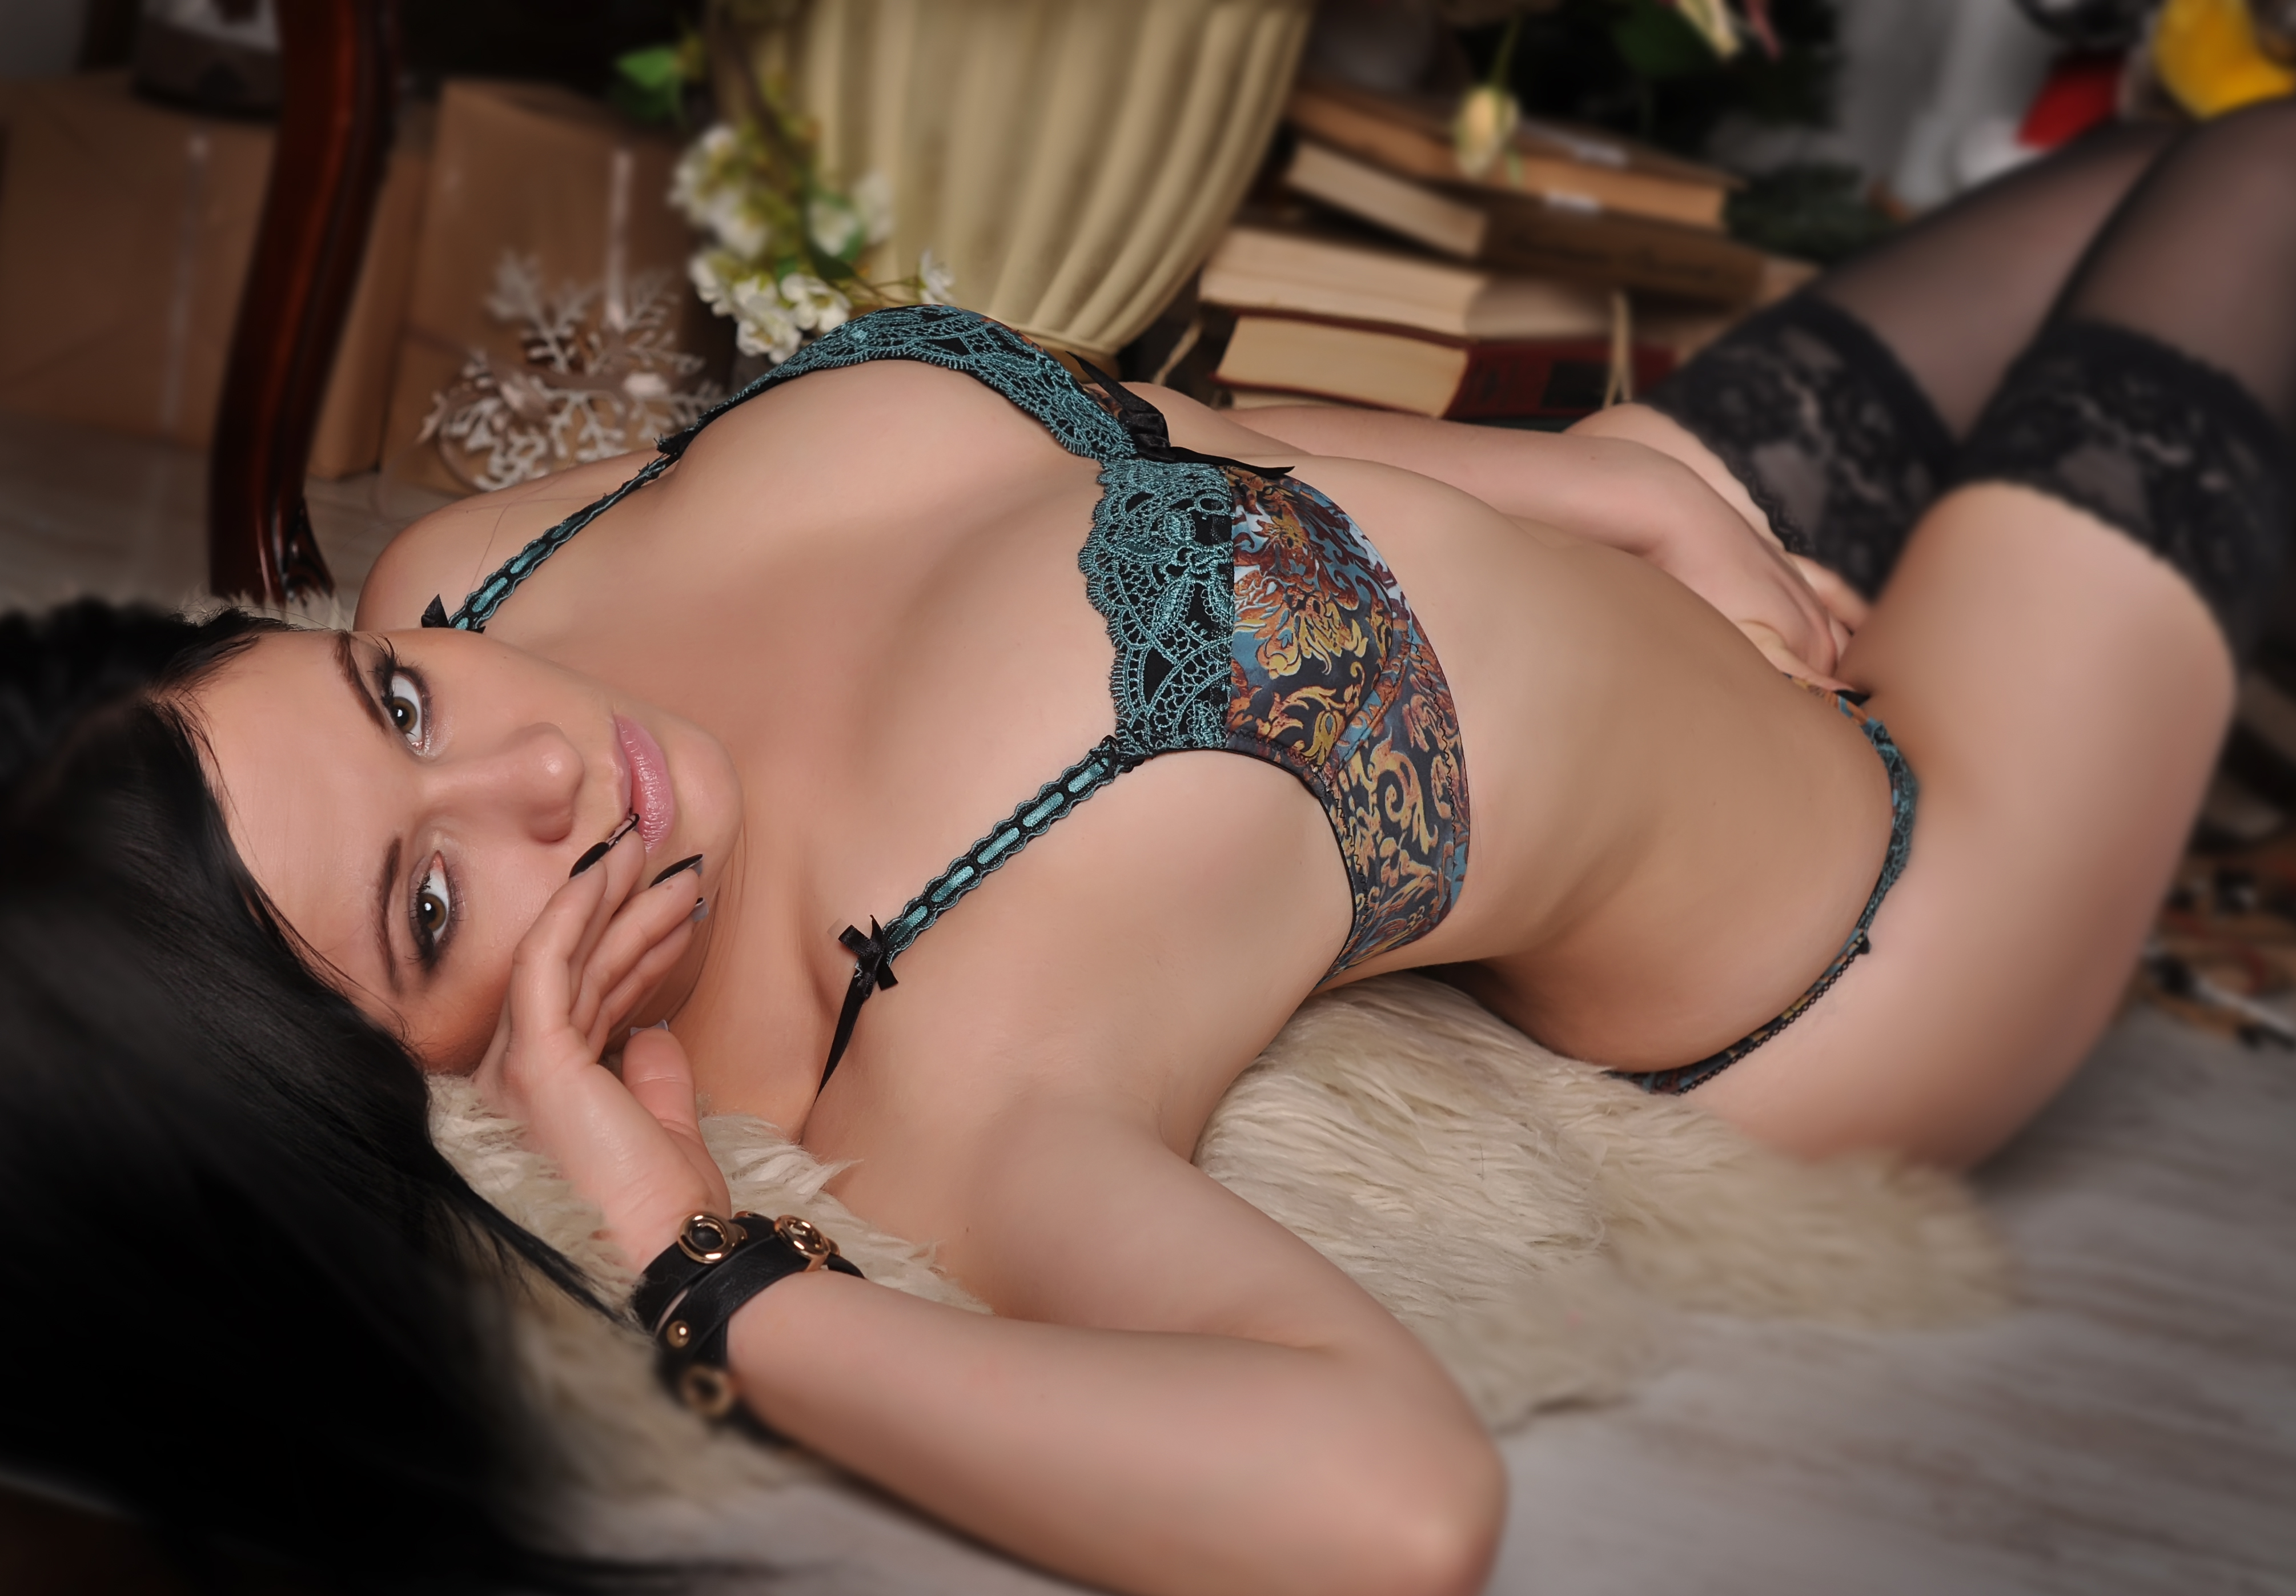 мамба сайт для секс